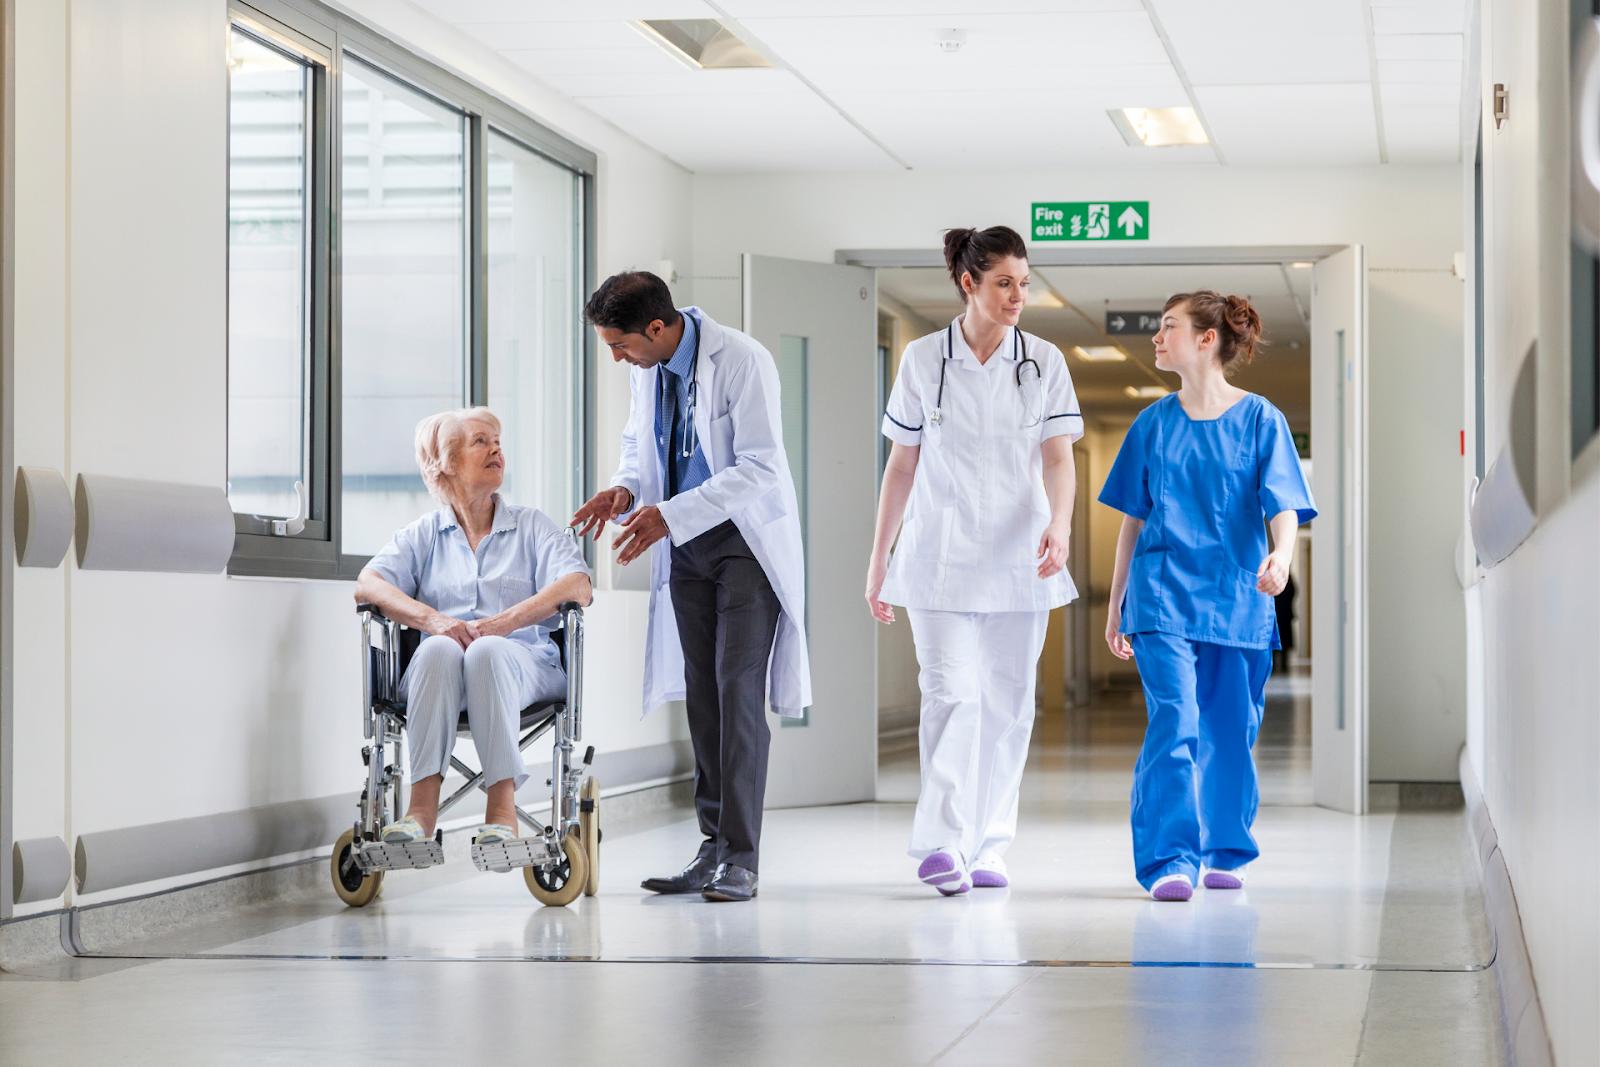 doctors and patient in hospital hallway